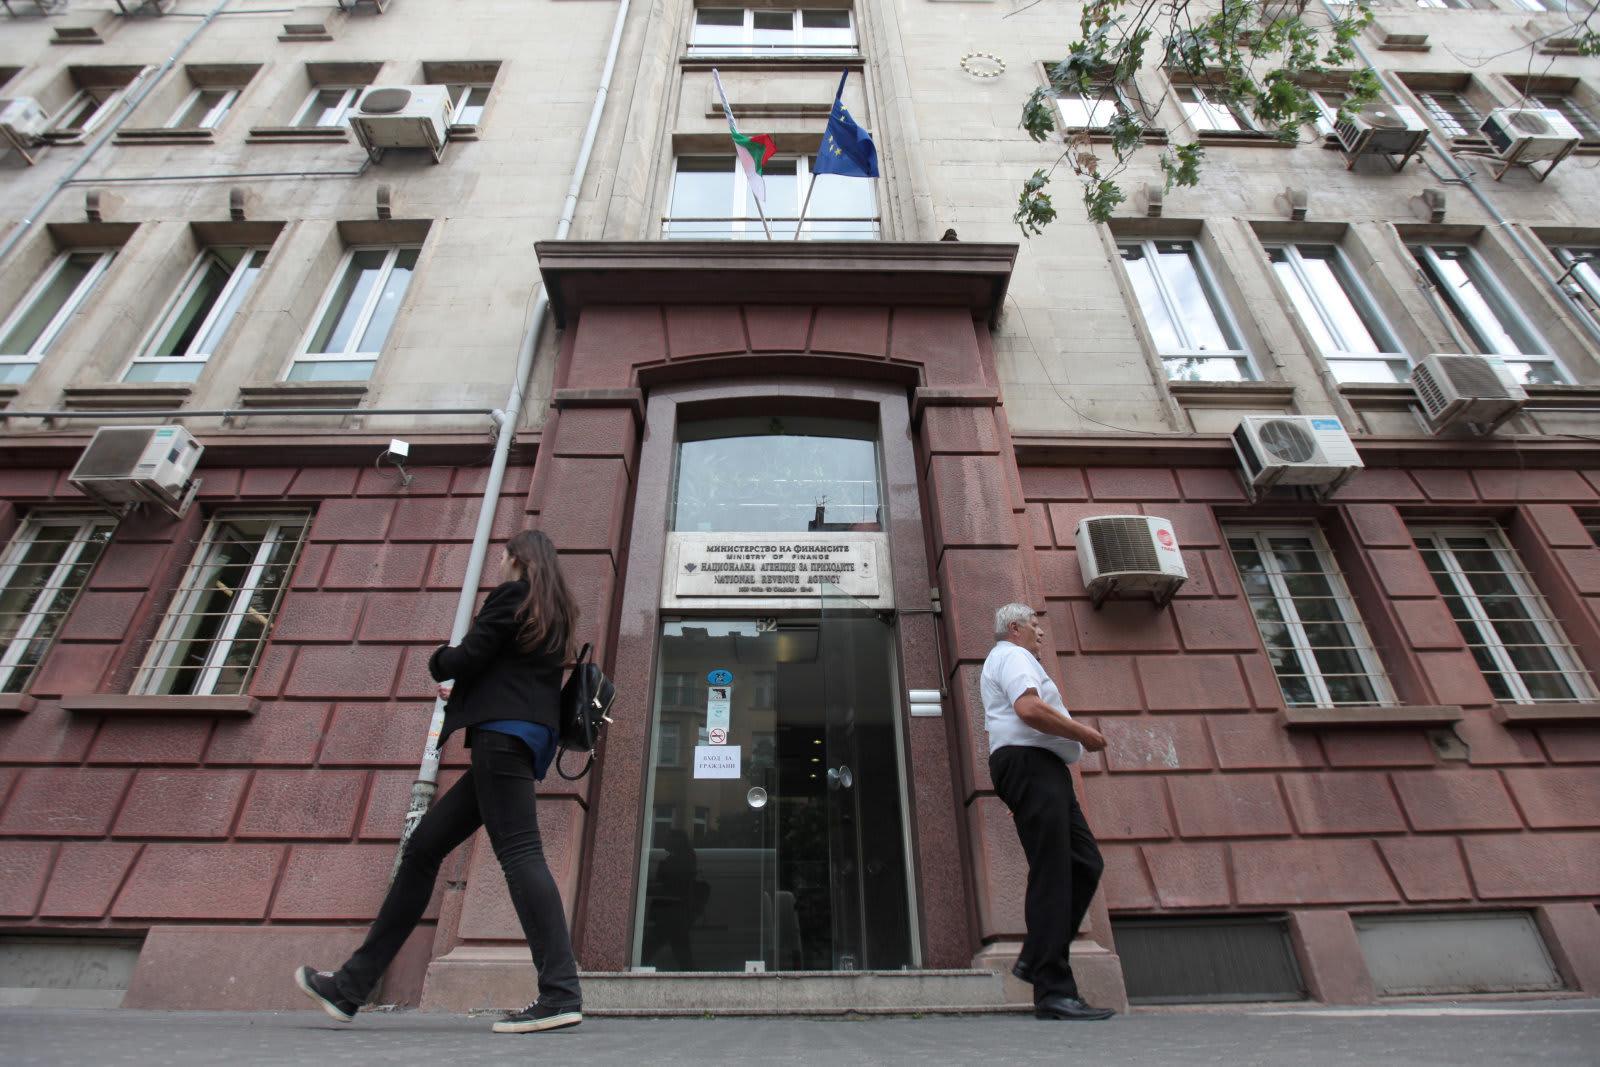 Dimitar Kyosemarliev / Reuters